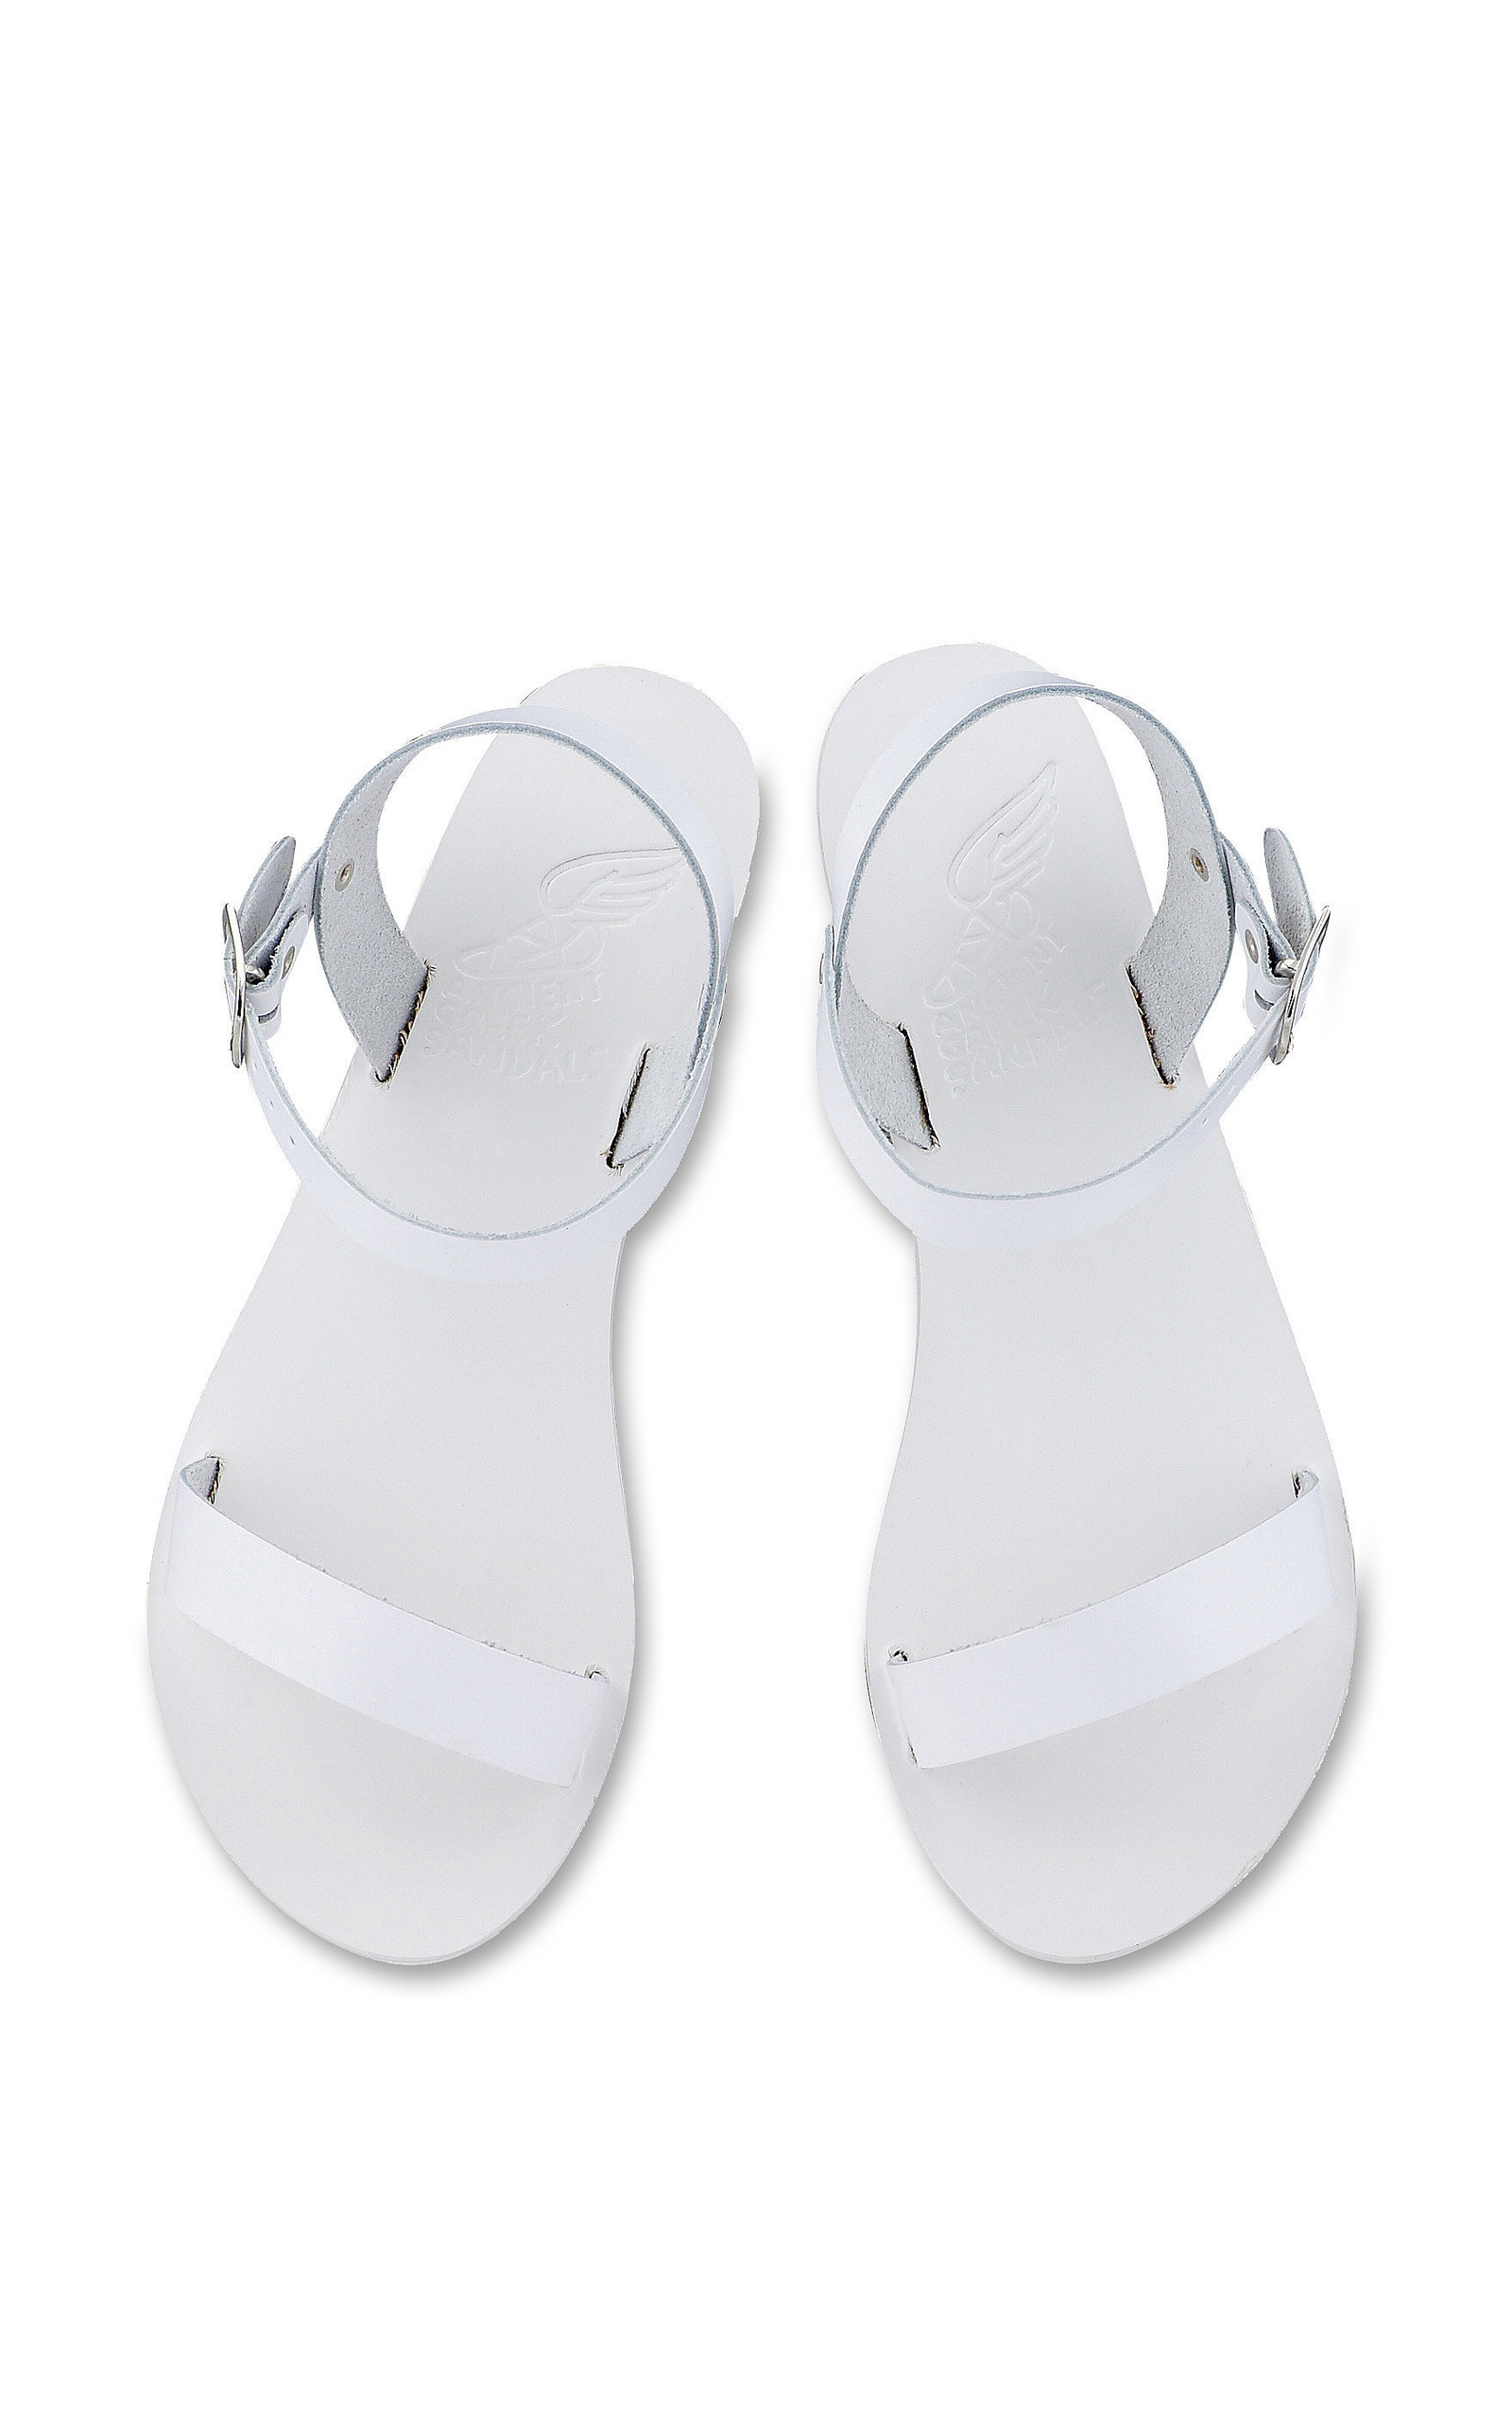 12f5e081a3 Ancient Greek SandalsDrama Platform Sandal In All White. CLOSE. Loading.  Loading